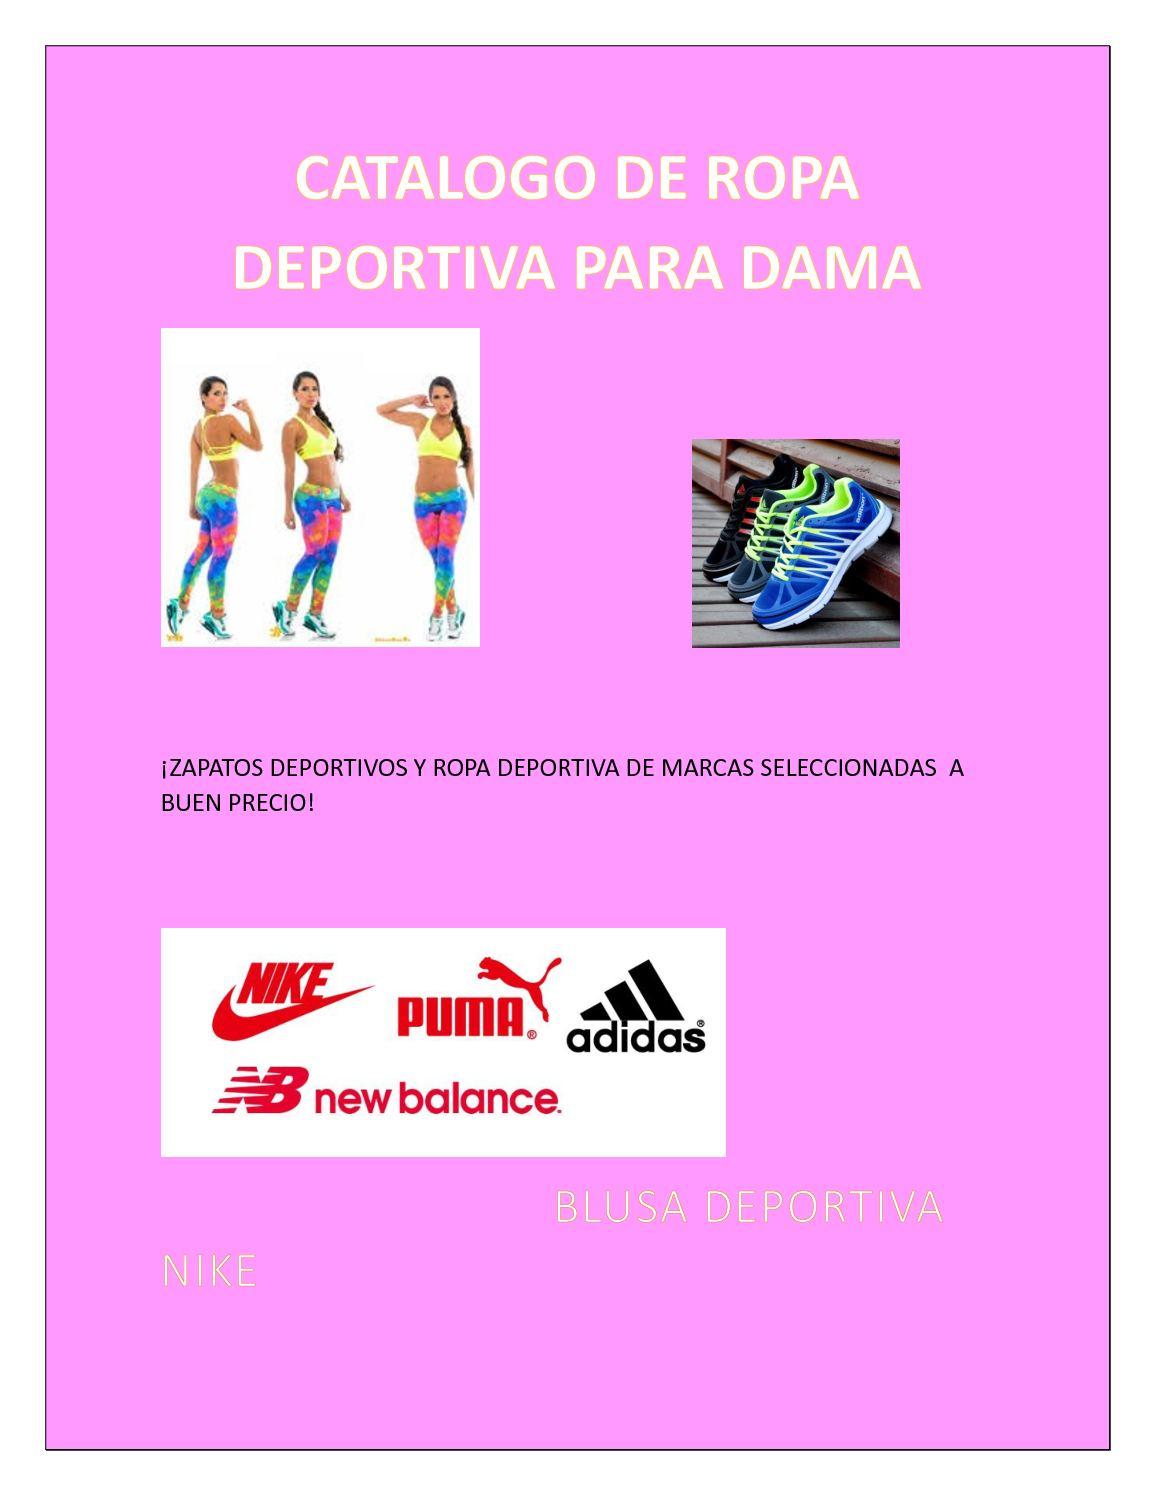 reputable site a9ef5 27ce5 Calaméo - Catalogo De Ropa Deportiva Para Dama